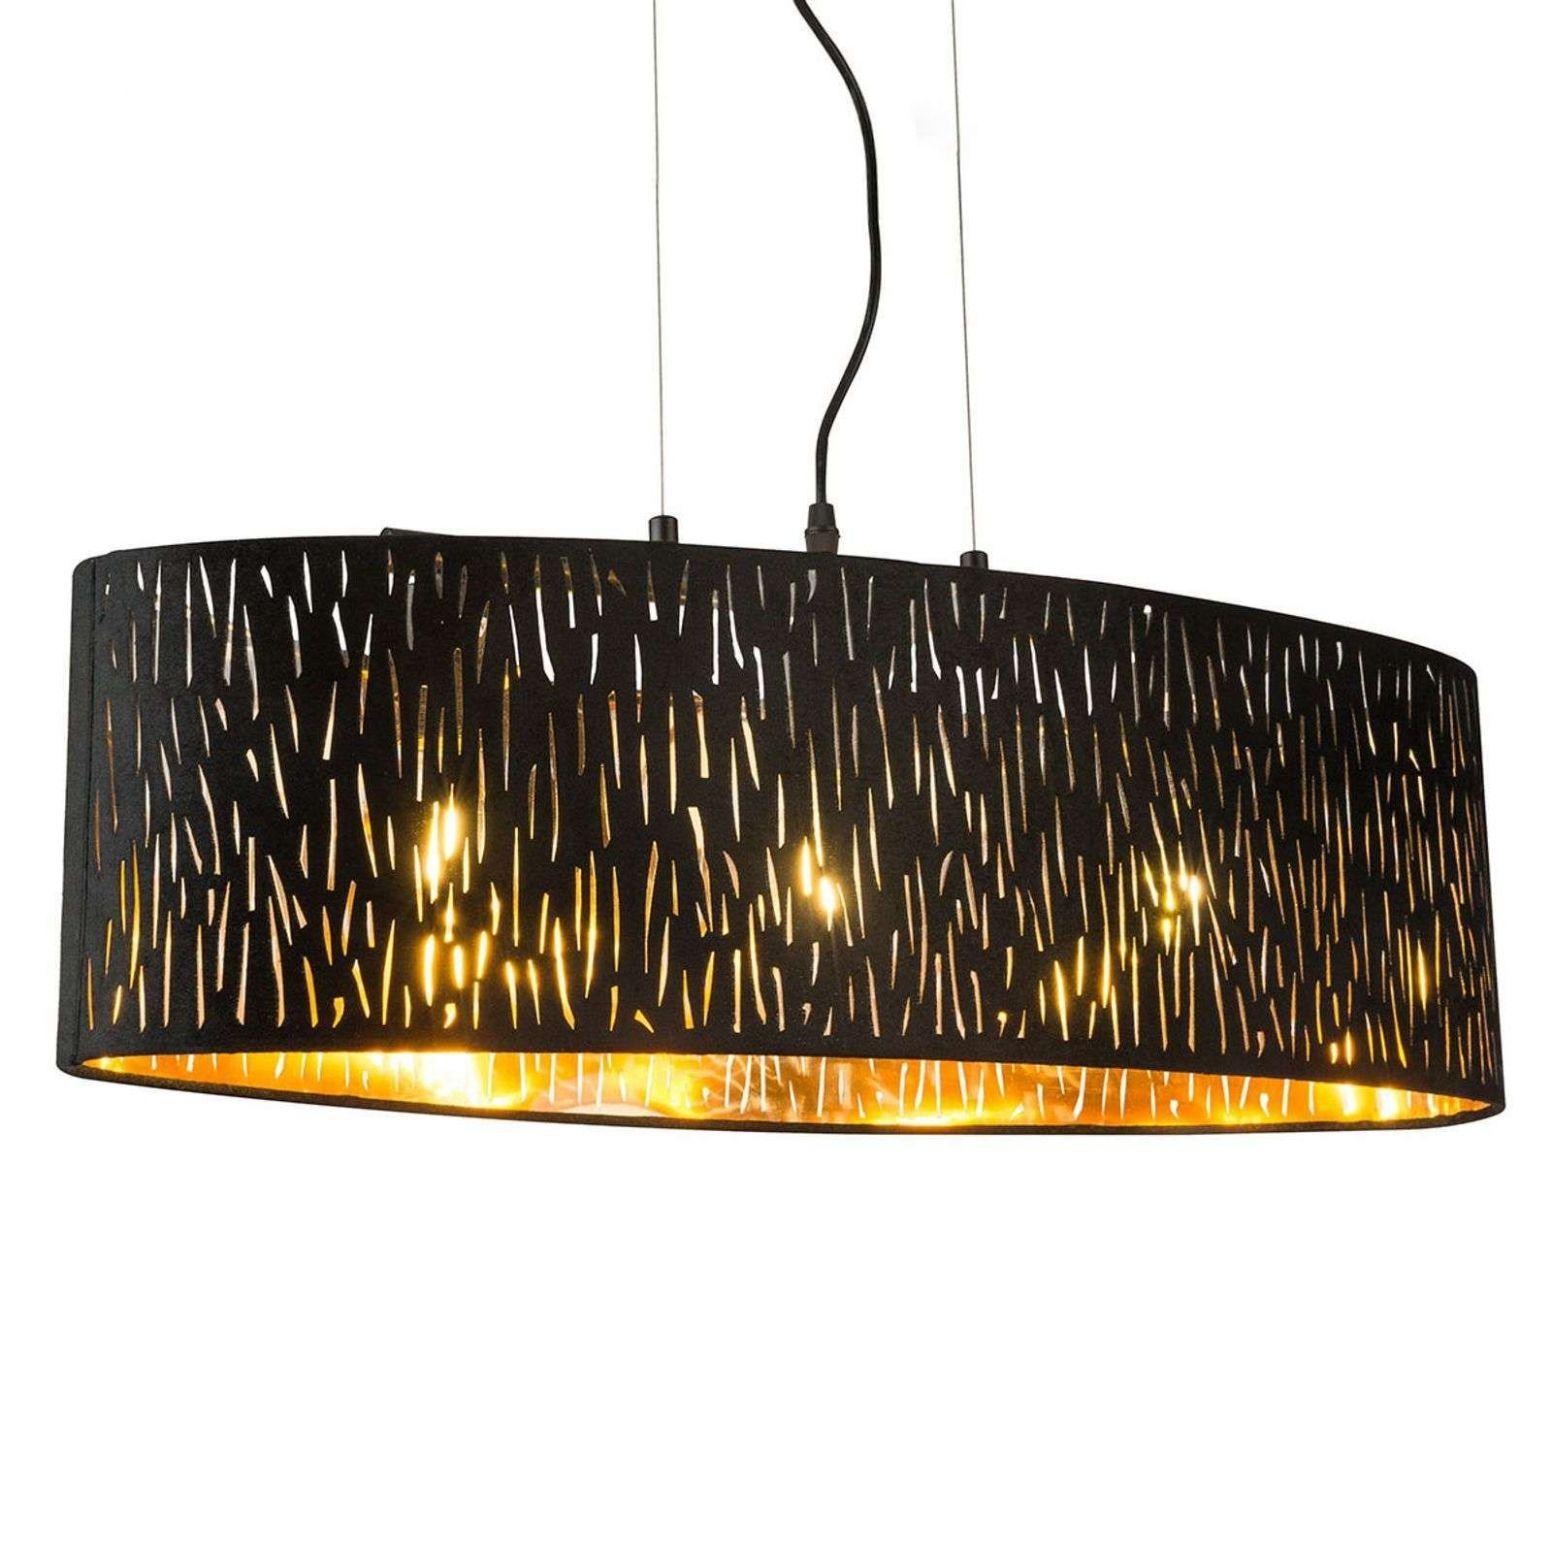 9 Dichter Lampe Pendelleuchte In 2020 Hanging Lights Pendant Light Light